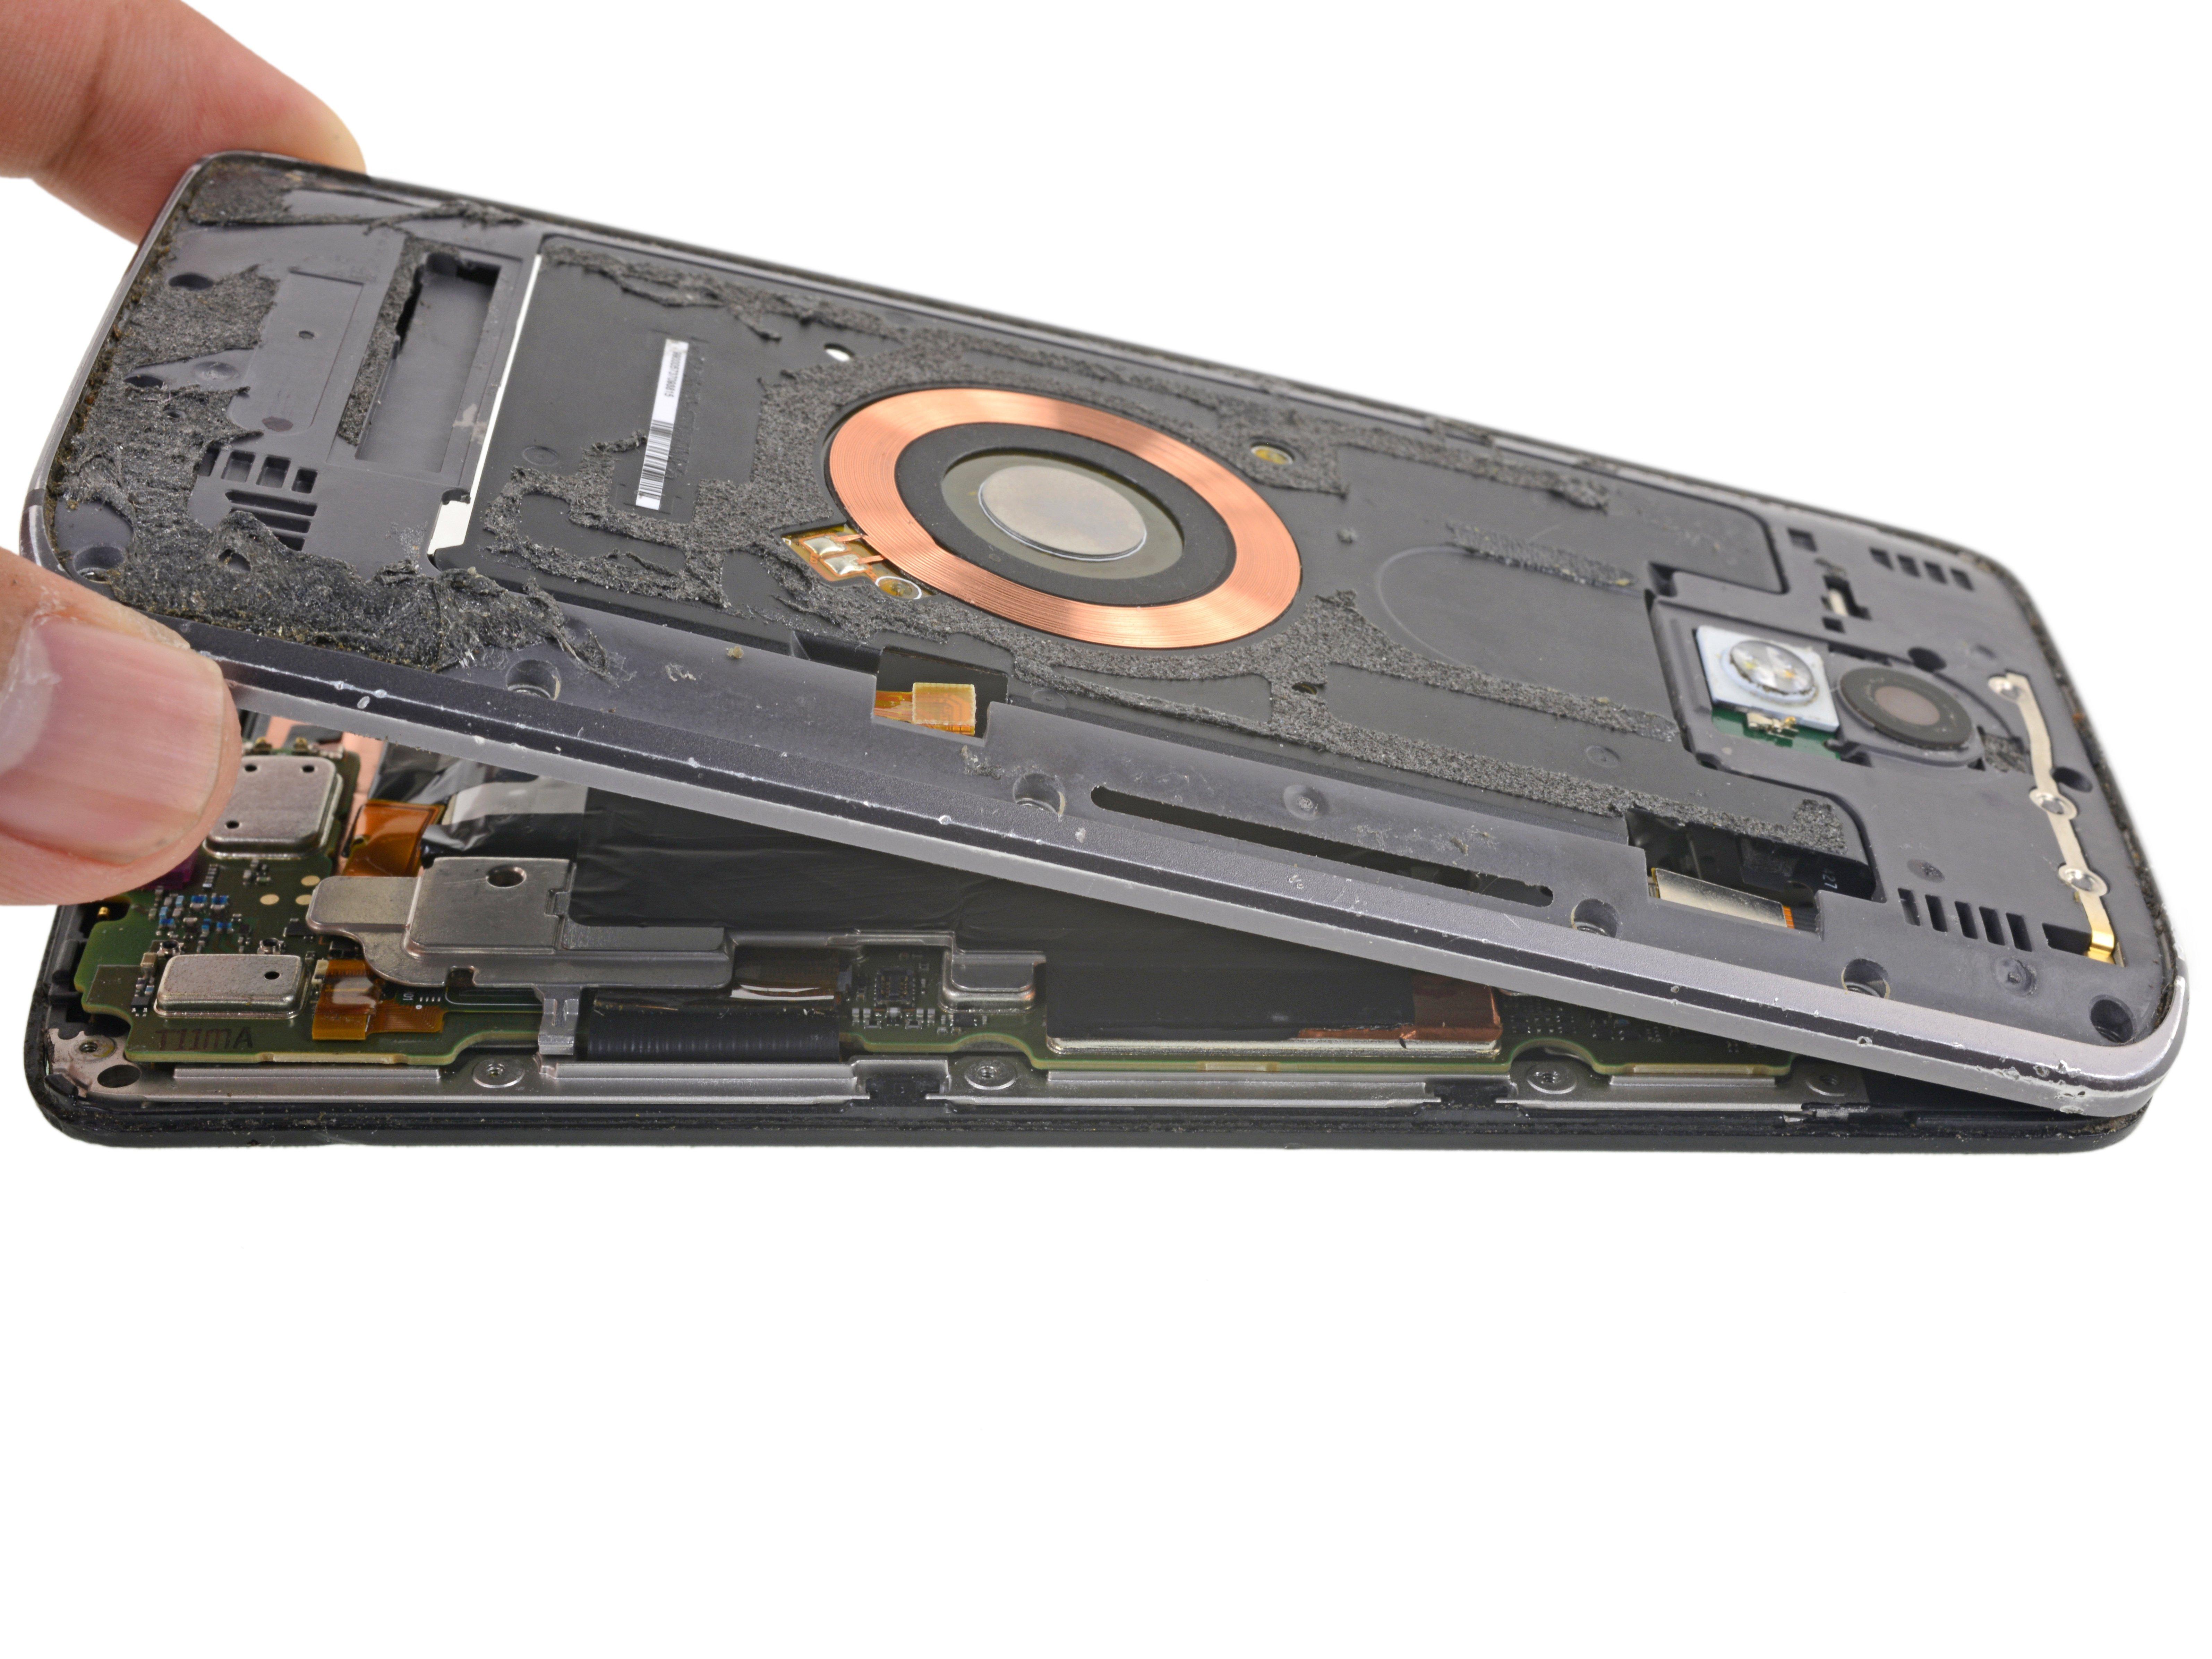 Motorola Droid Turbo 2 Midframe Replacement - iFixit Repair